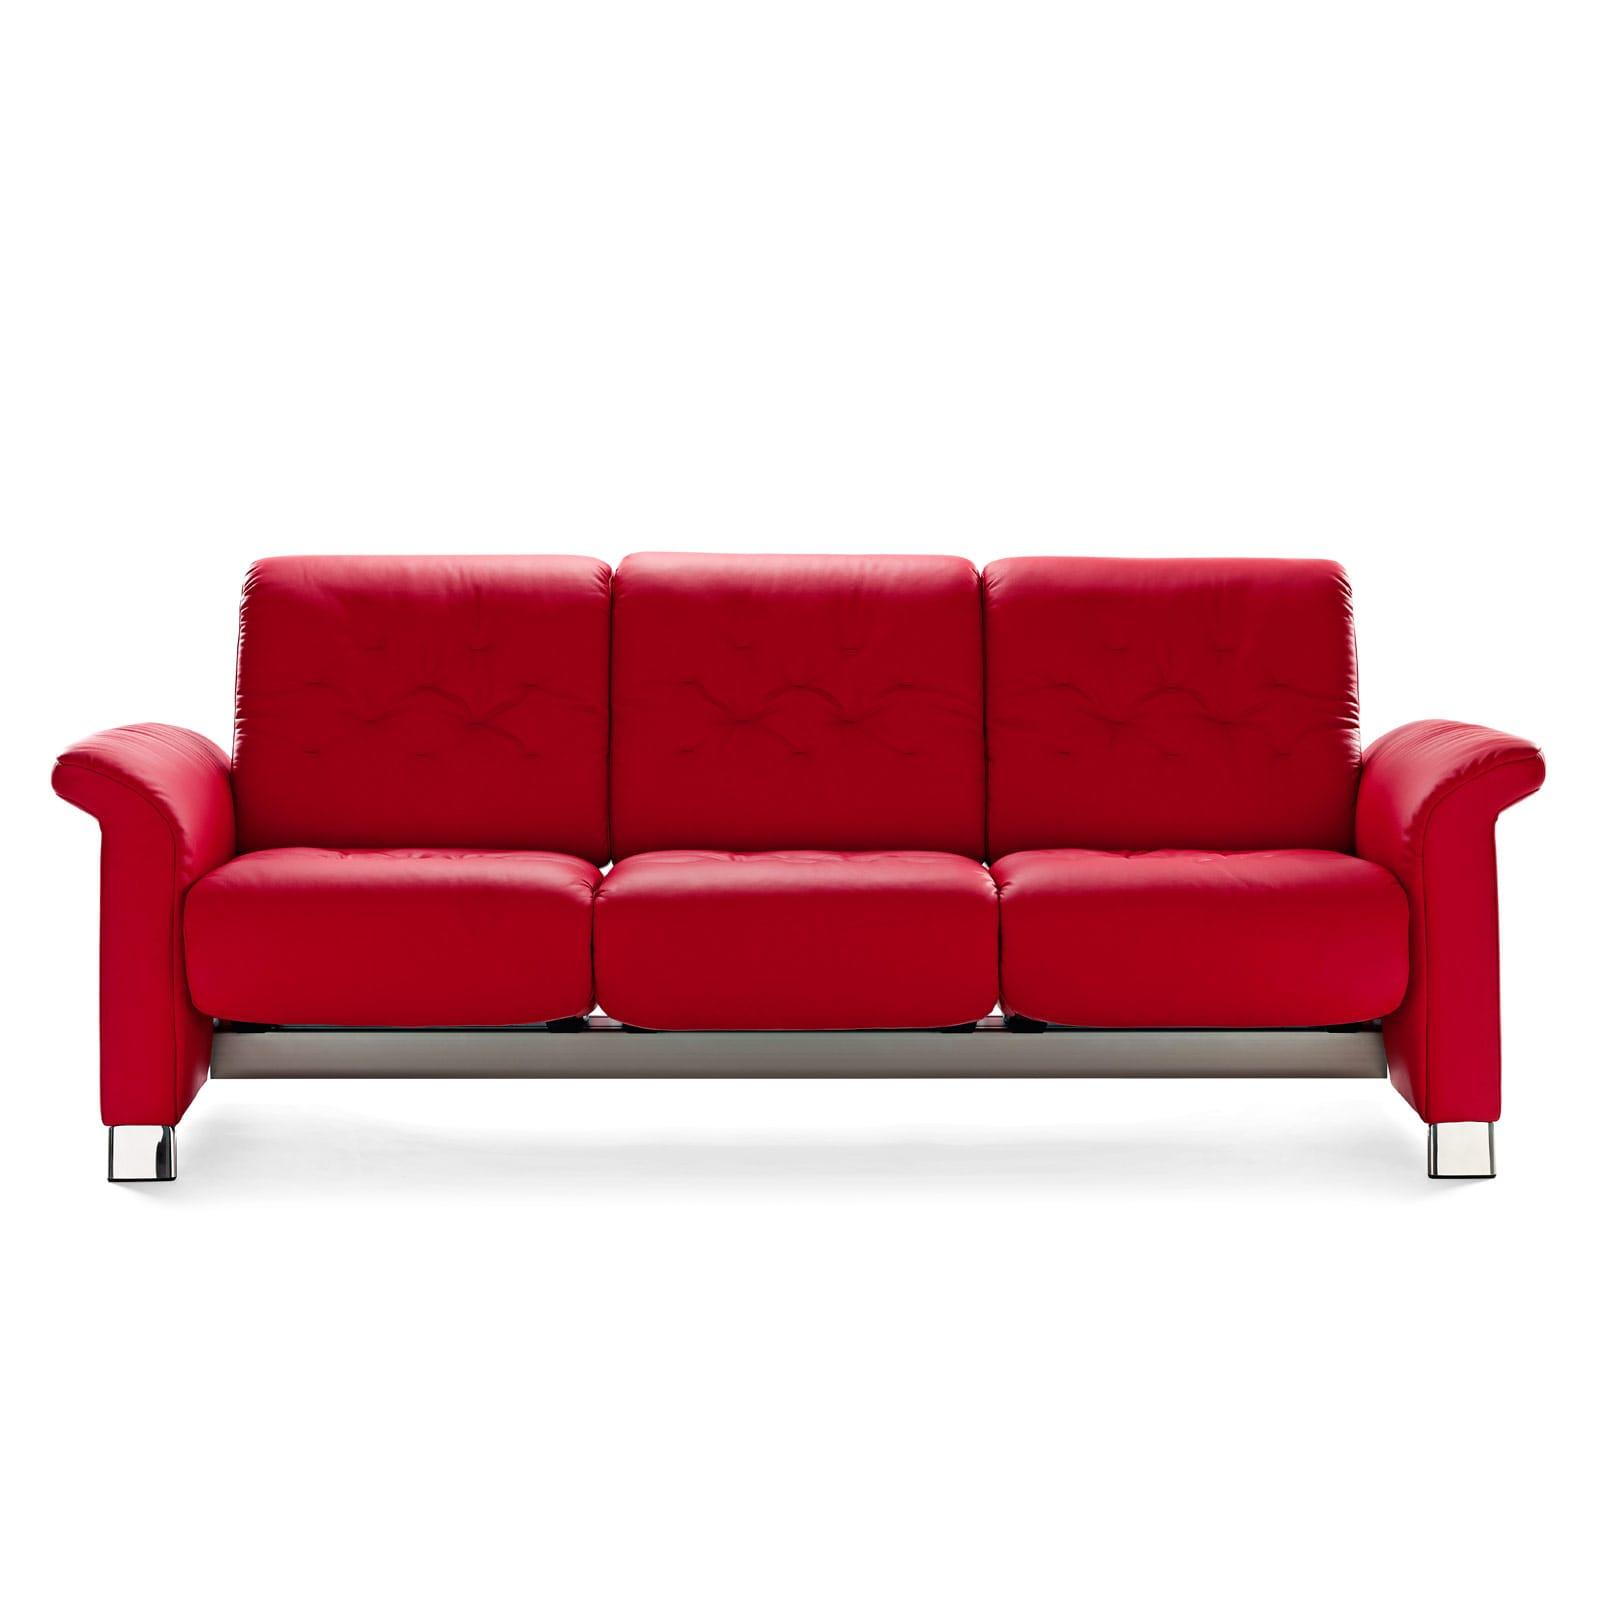 stressless sofa 3 sitzer metropolitan m paloma tomato. Black Bedroom Furniture Sets. Home Design Ideas